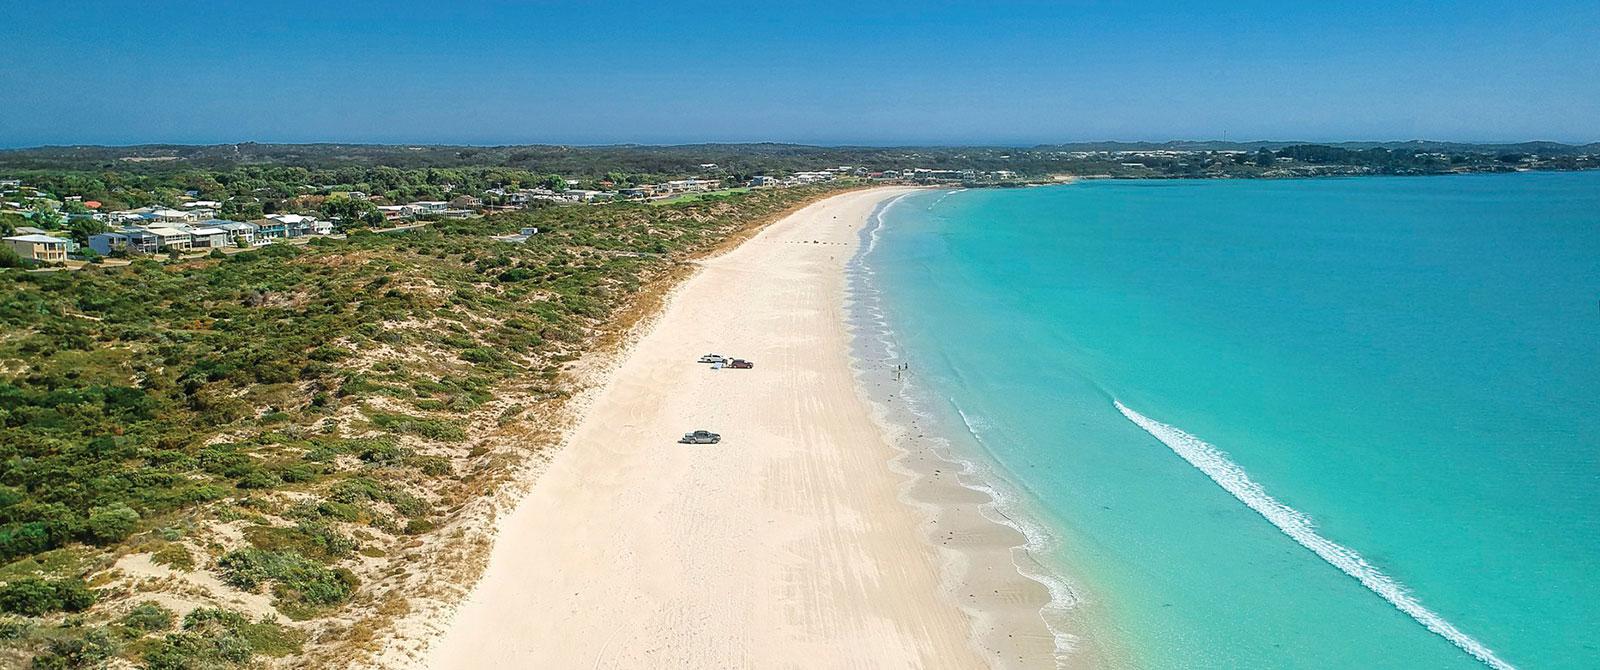 Great Ocean Road Tour - Australia Vacations - Long Beach South Australia